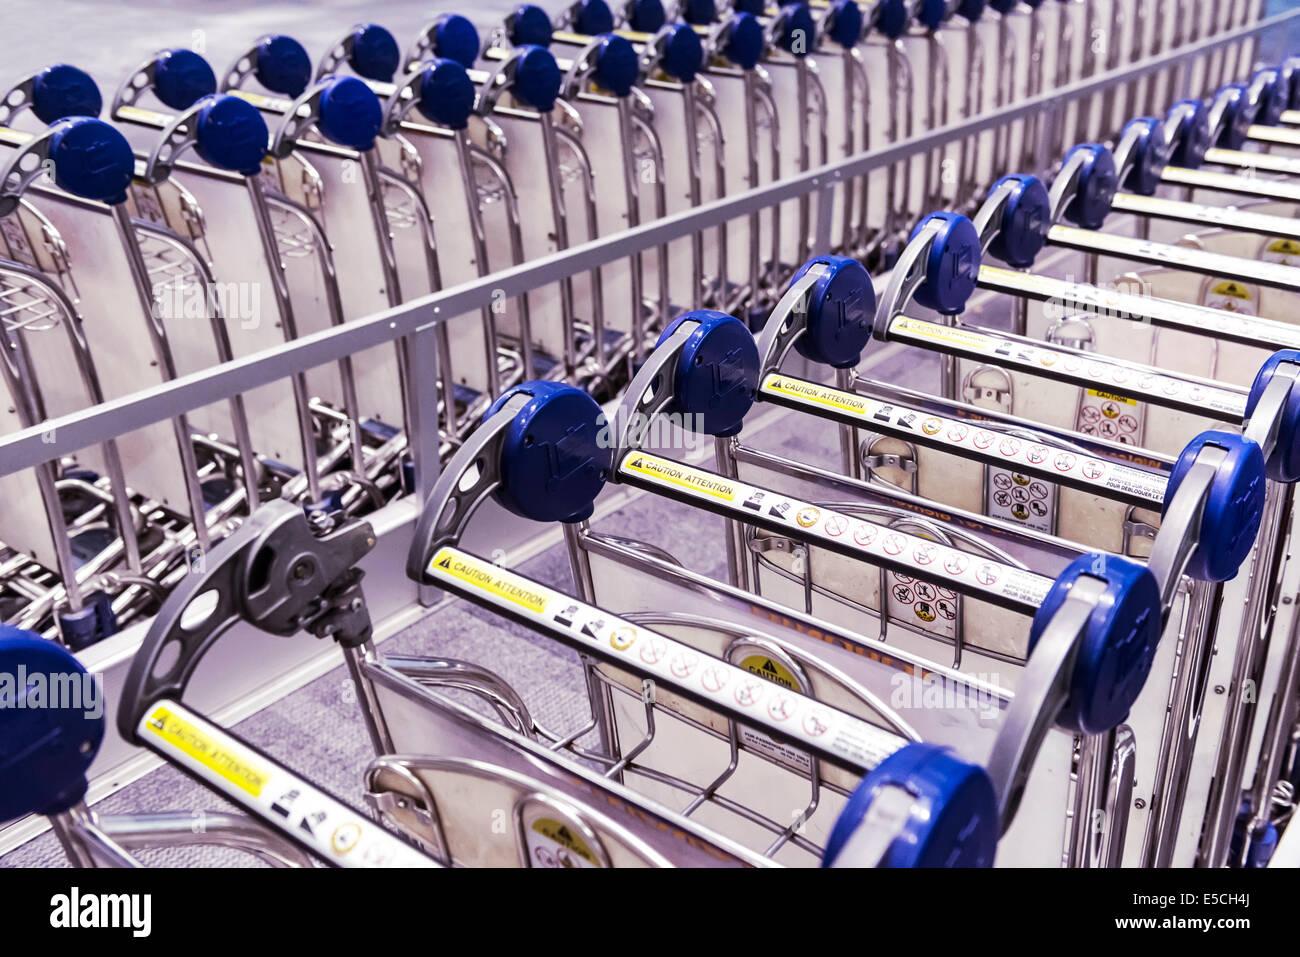 Baggage carts rental at Toronto Pearson International airport, Canada - Stock Image